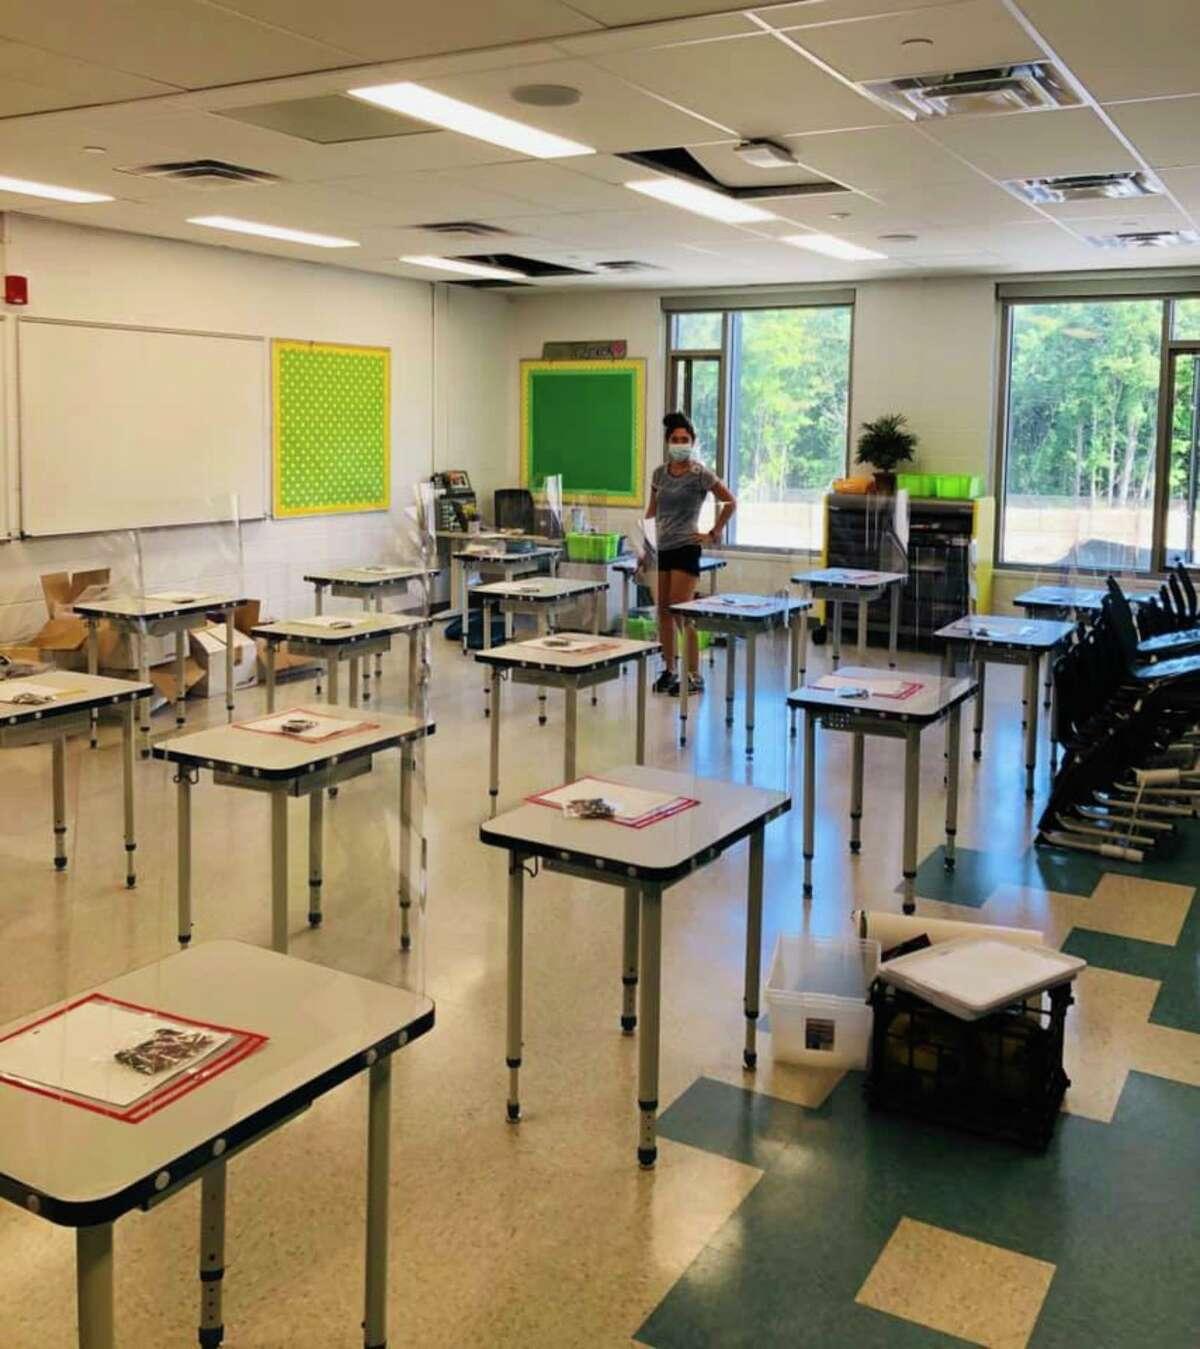 Johnson Elementary School fourth-grade teacher Mrs. Trzcinski gets her classroom ready for students.